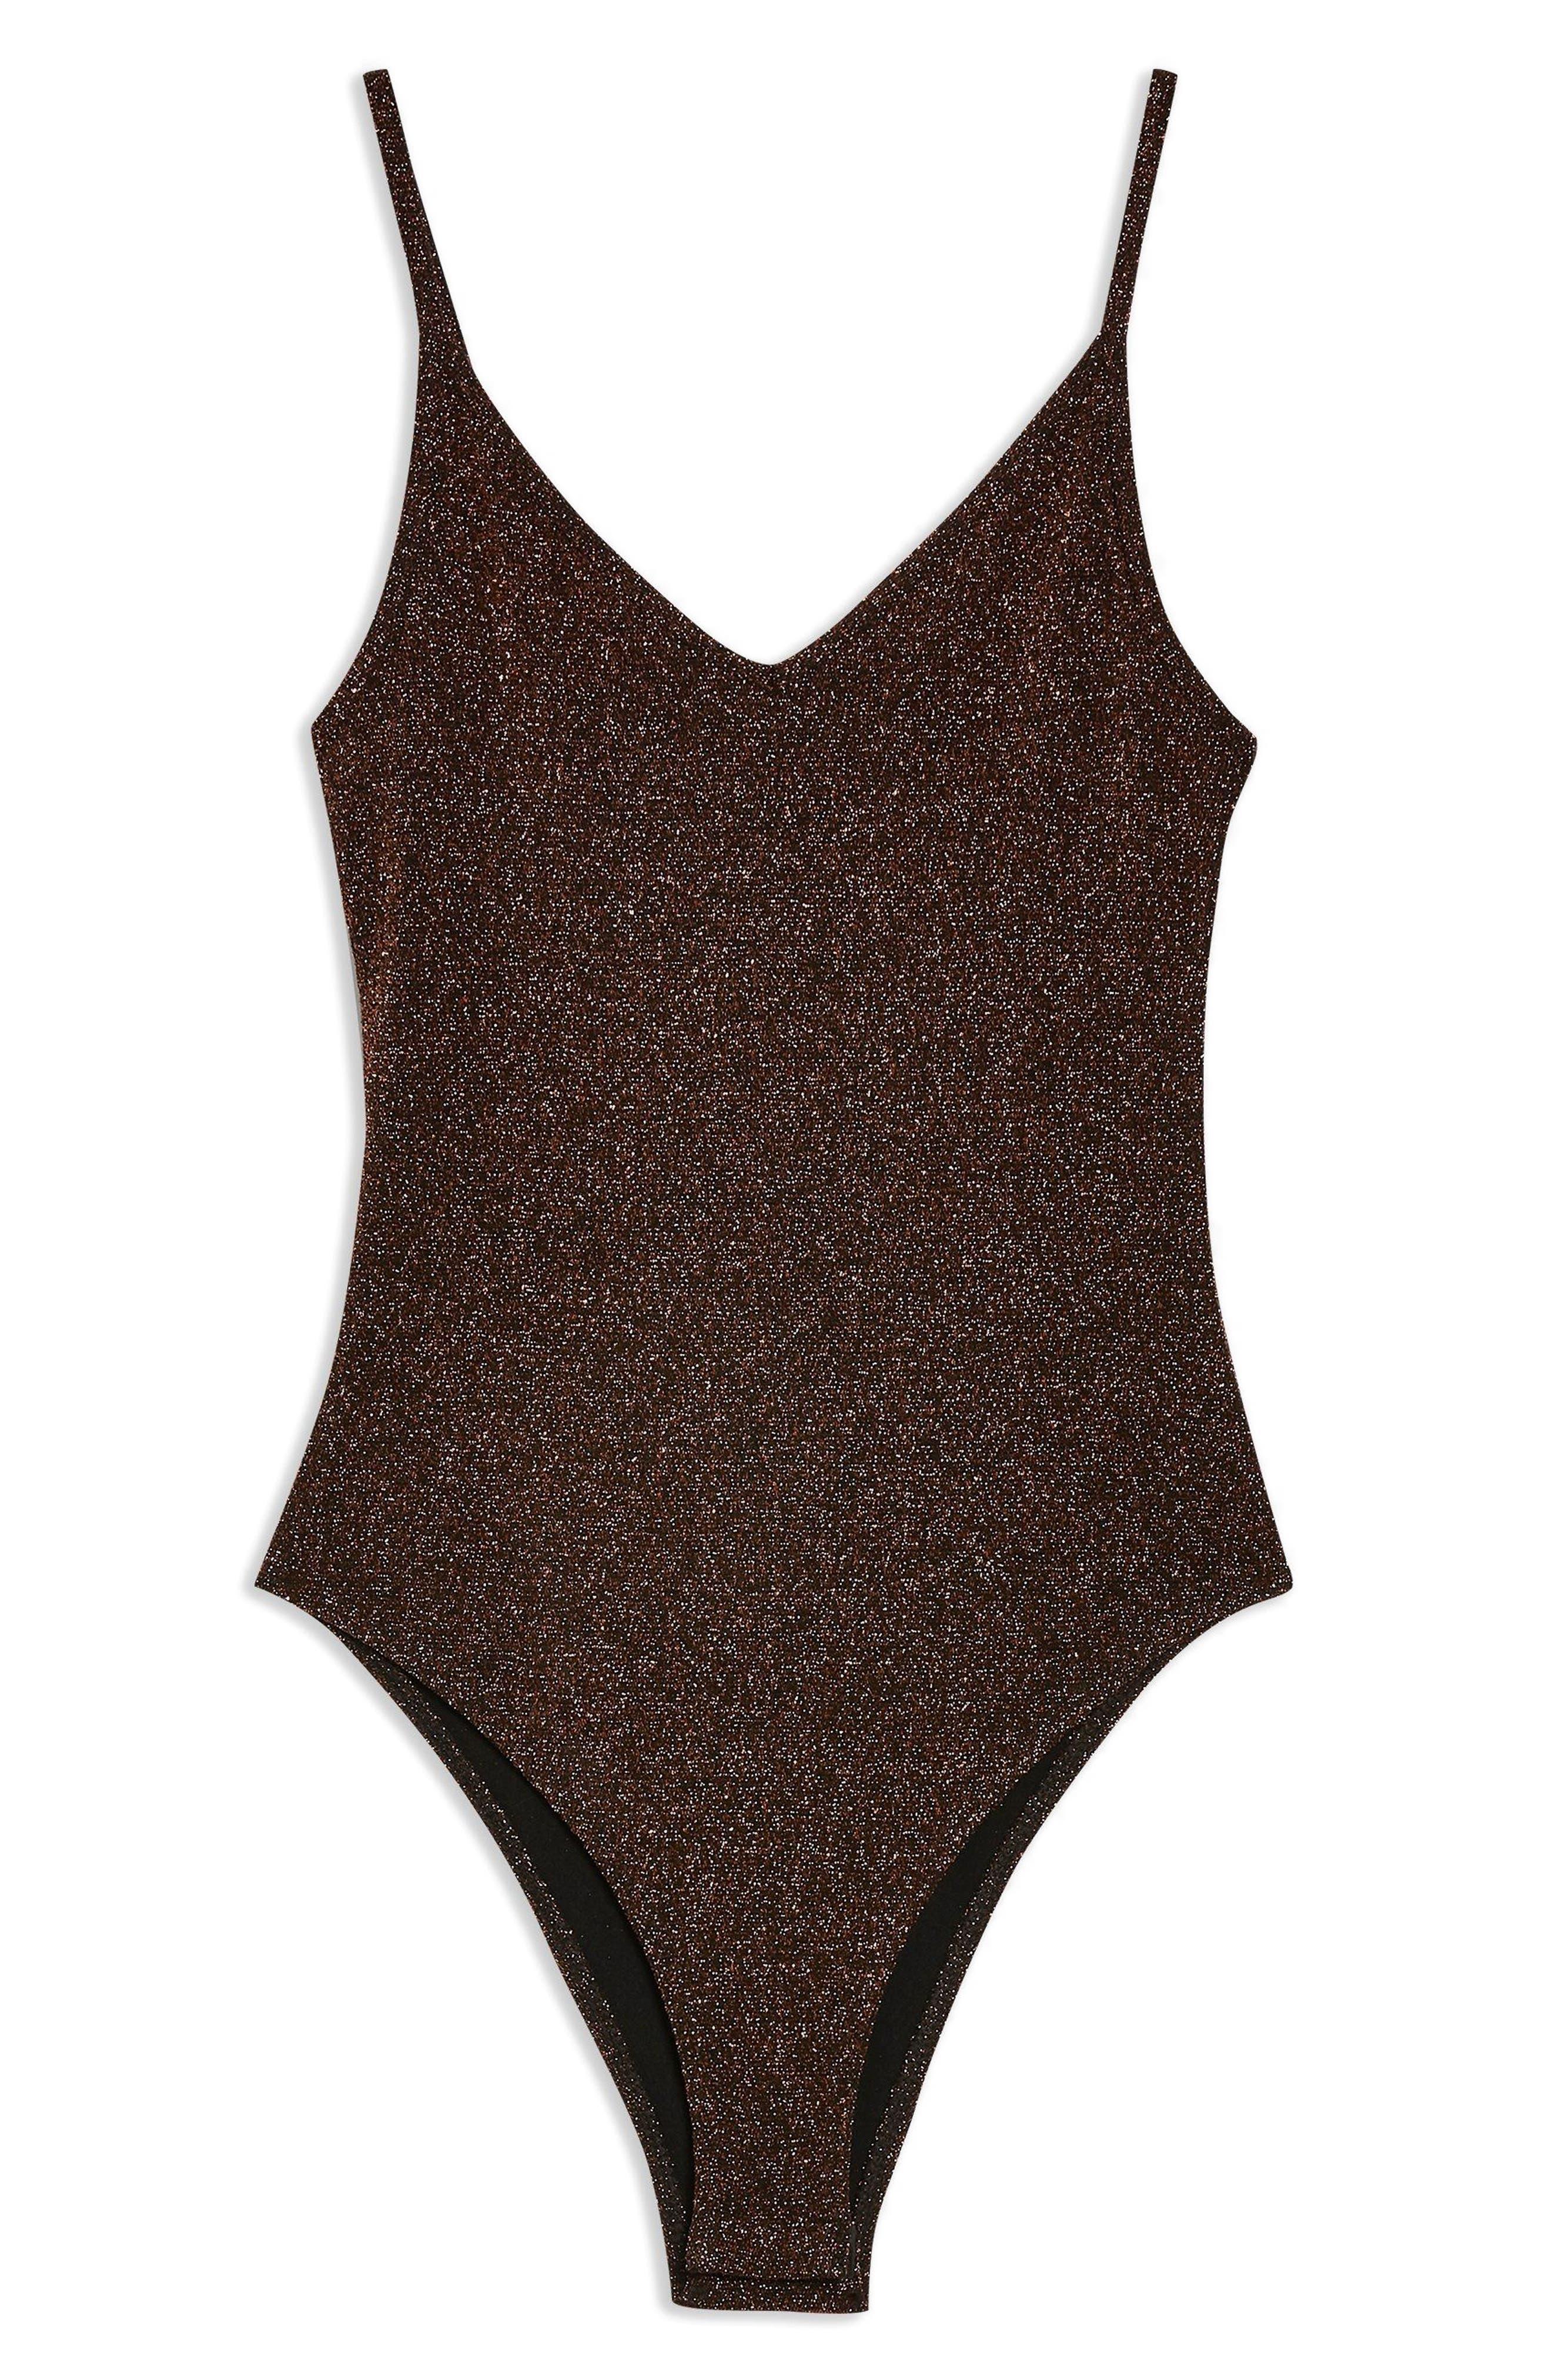 TOPSHOP,                             Metallic Bodysuit,                             Alternate thumbnail 4, color,                             220